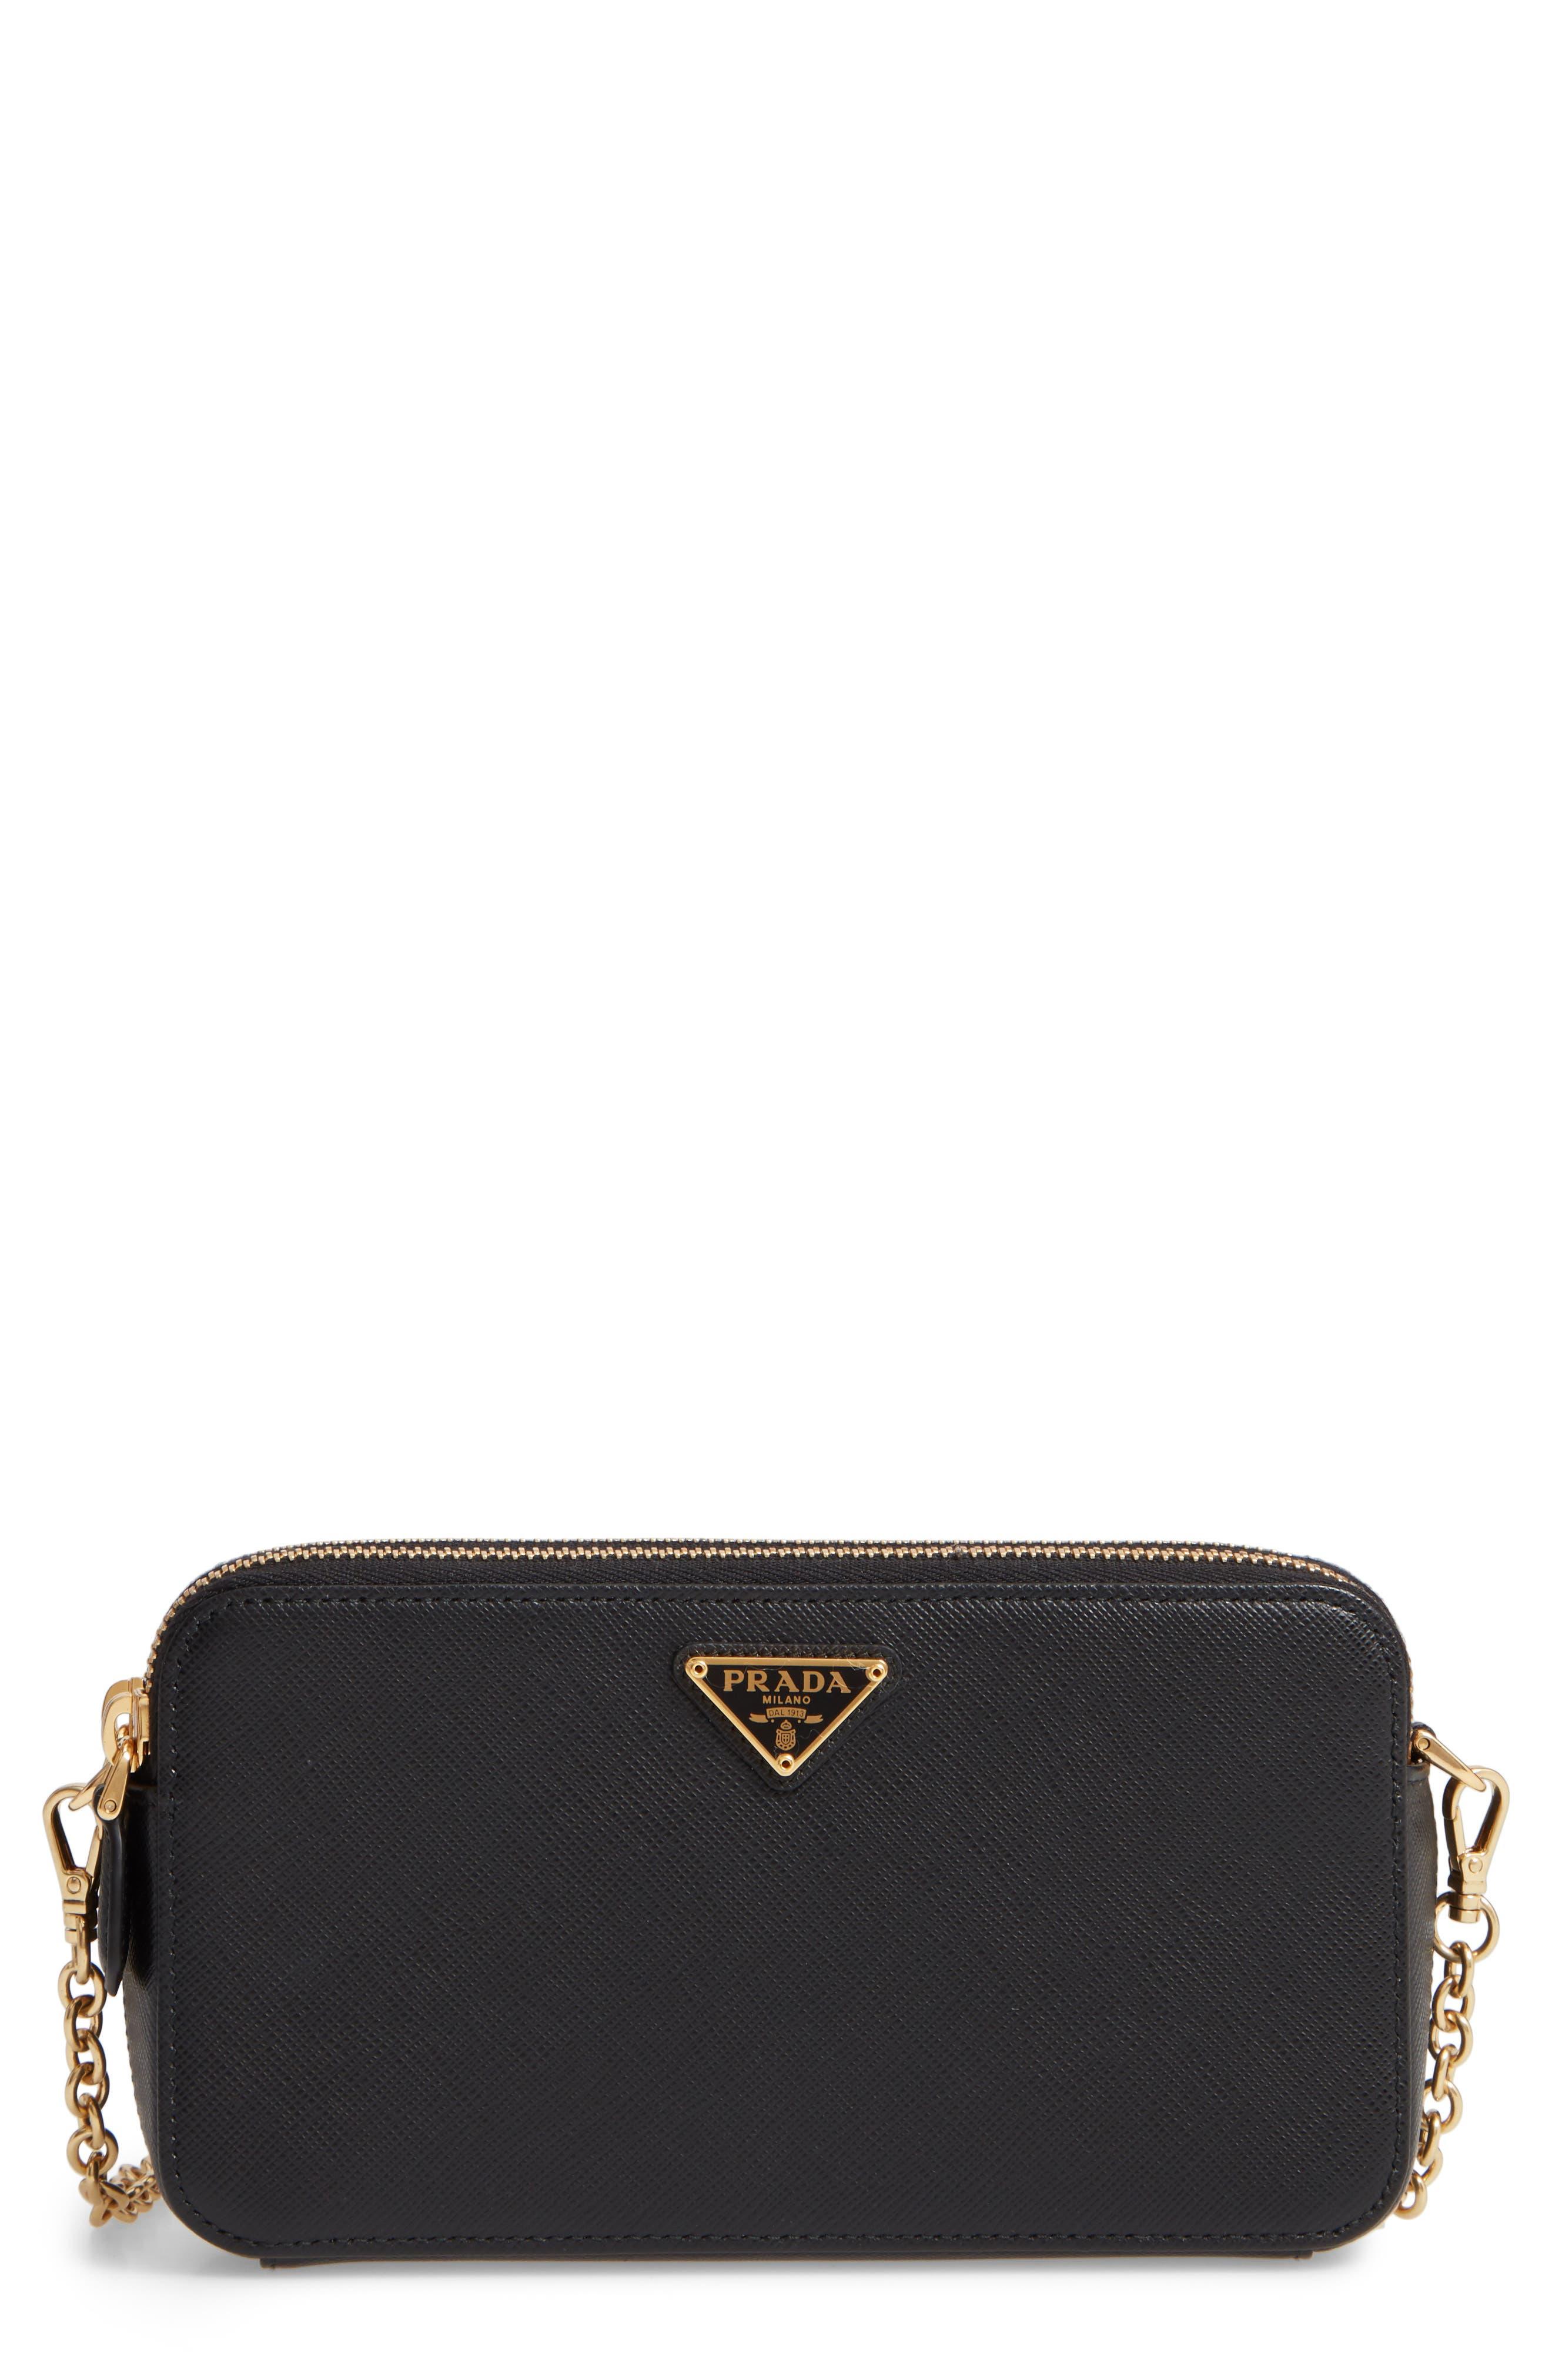 Small Double Compartment Zip Saffiano Leather Crossbody Bag,                             Main thumbnail 1, color,                             NERO